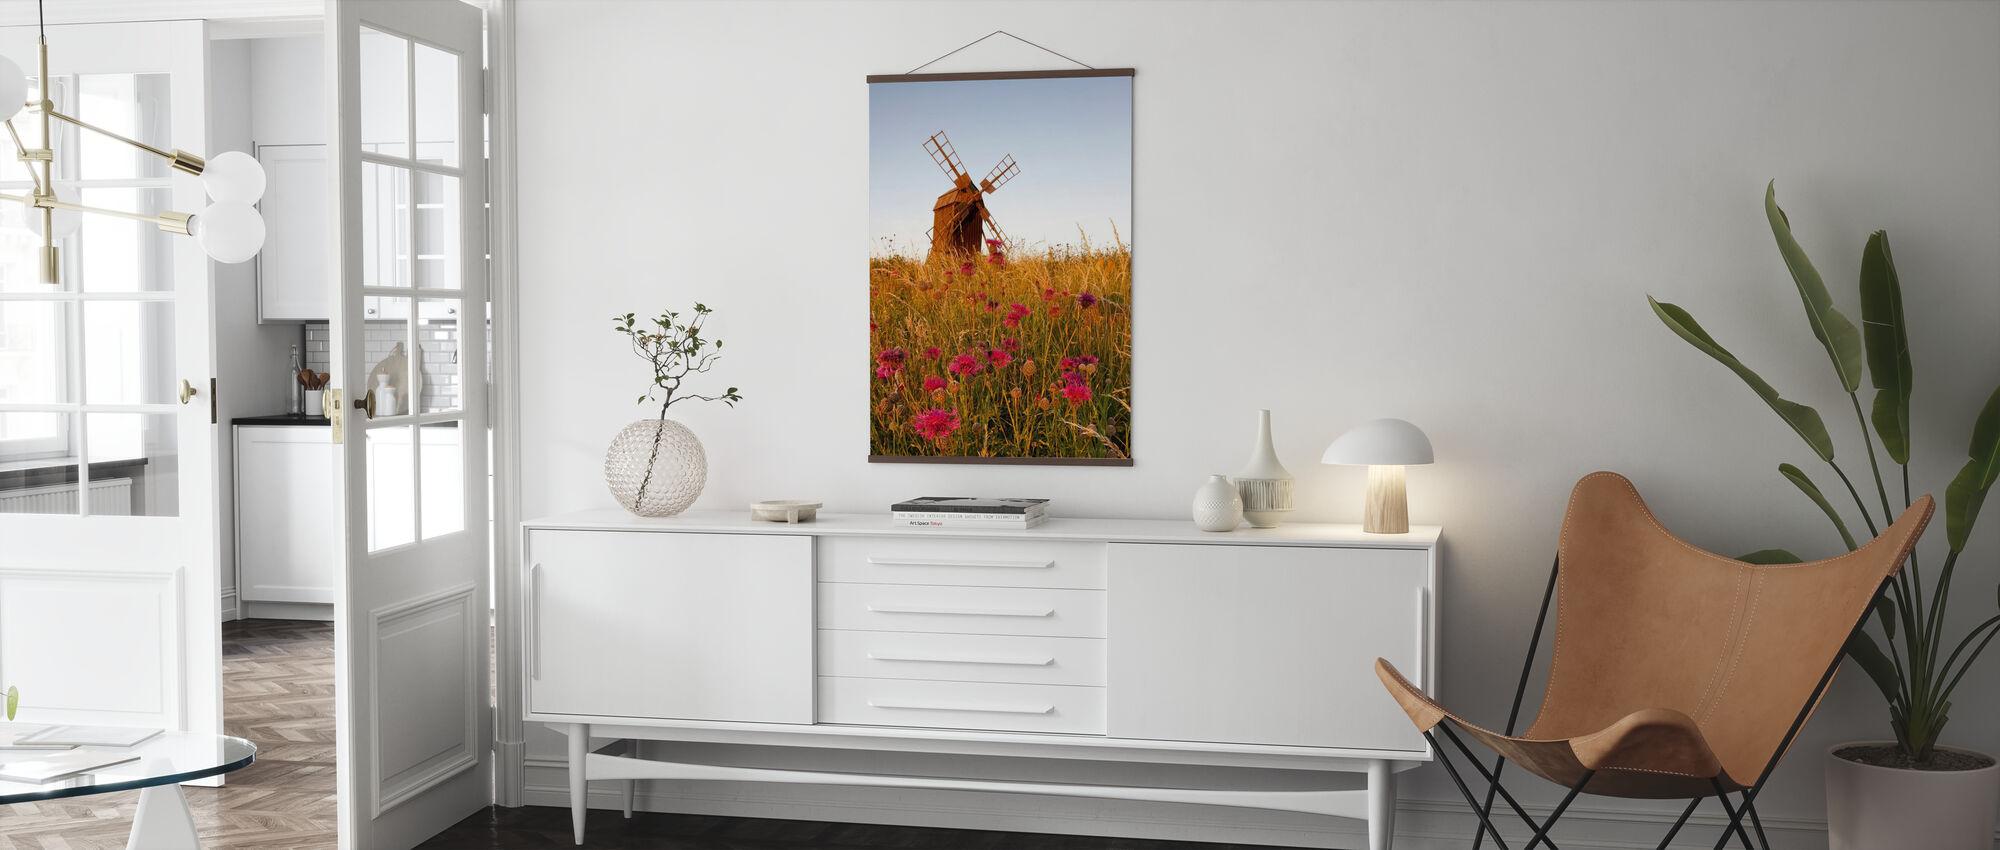 Grainy Windmill - Poster - Living Room